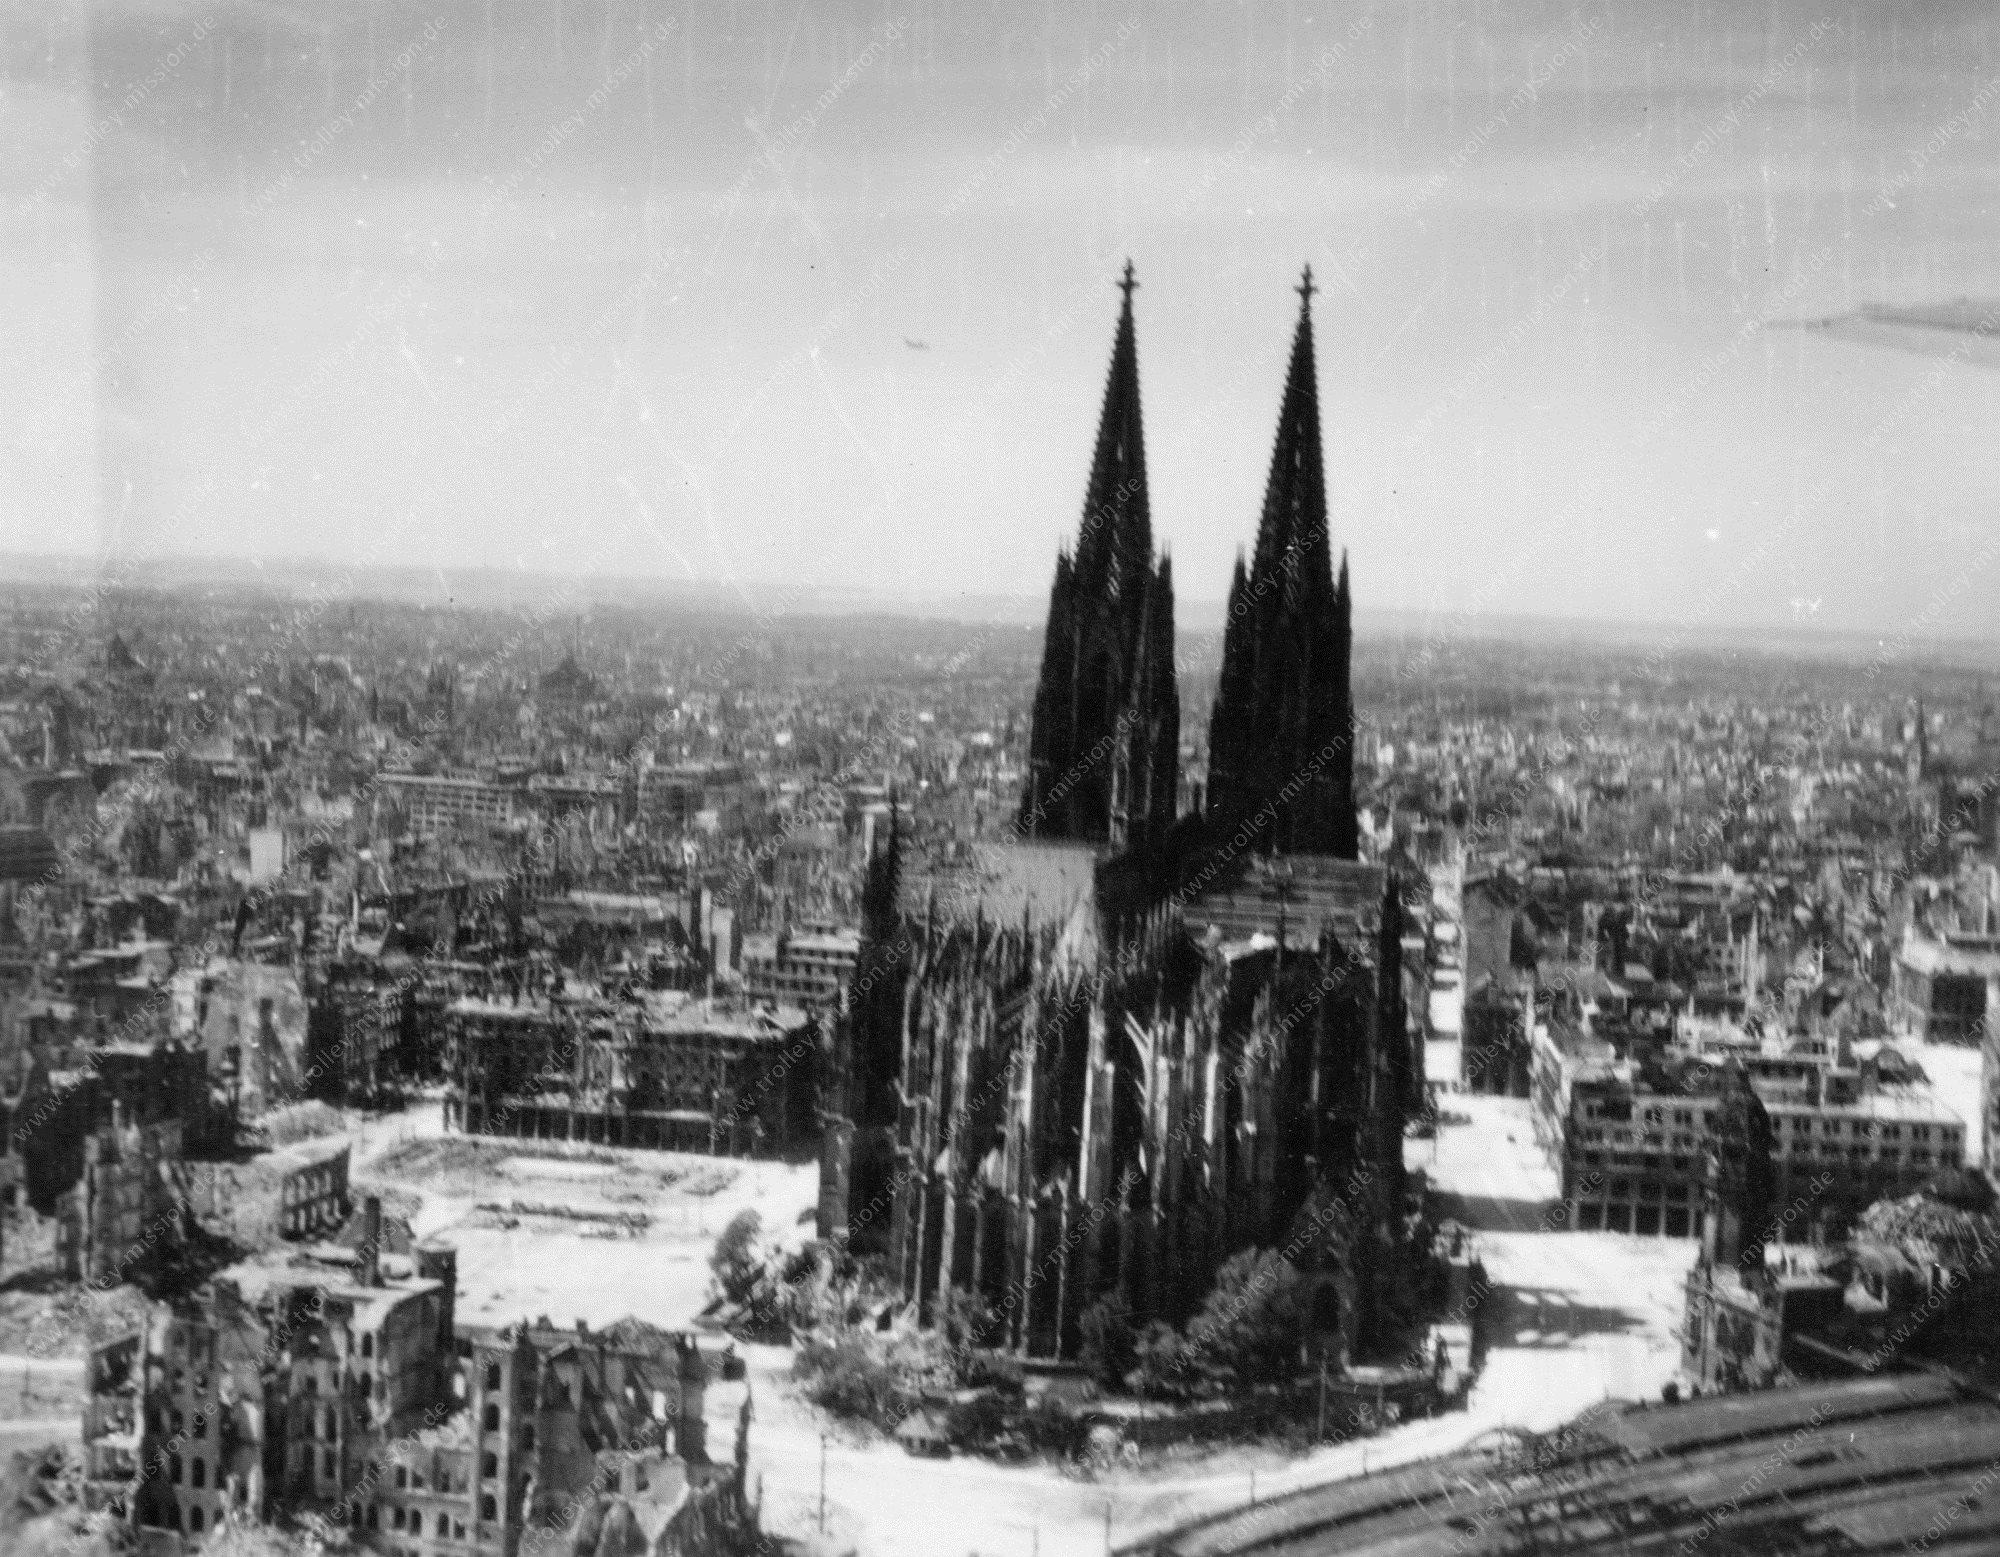 Kölner Dom Luftbild im Tiefflug mit Turm am Hauptbahnhof